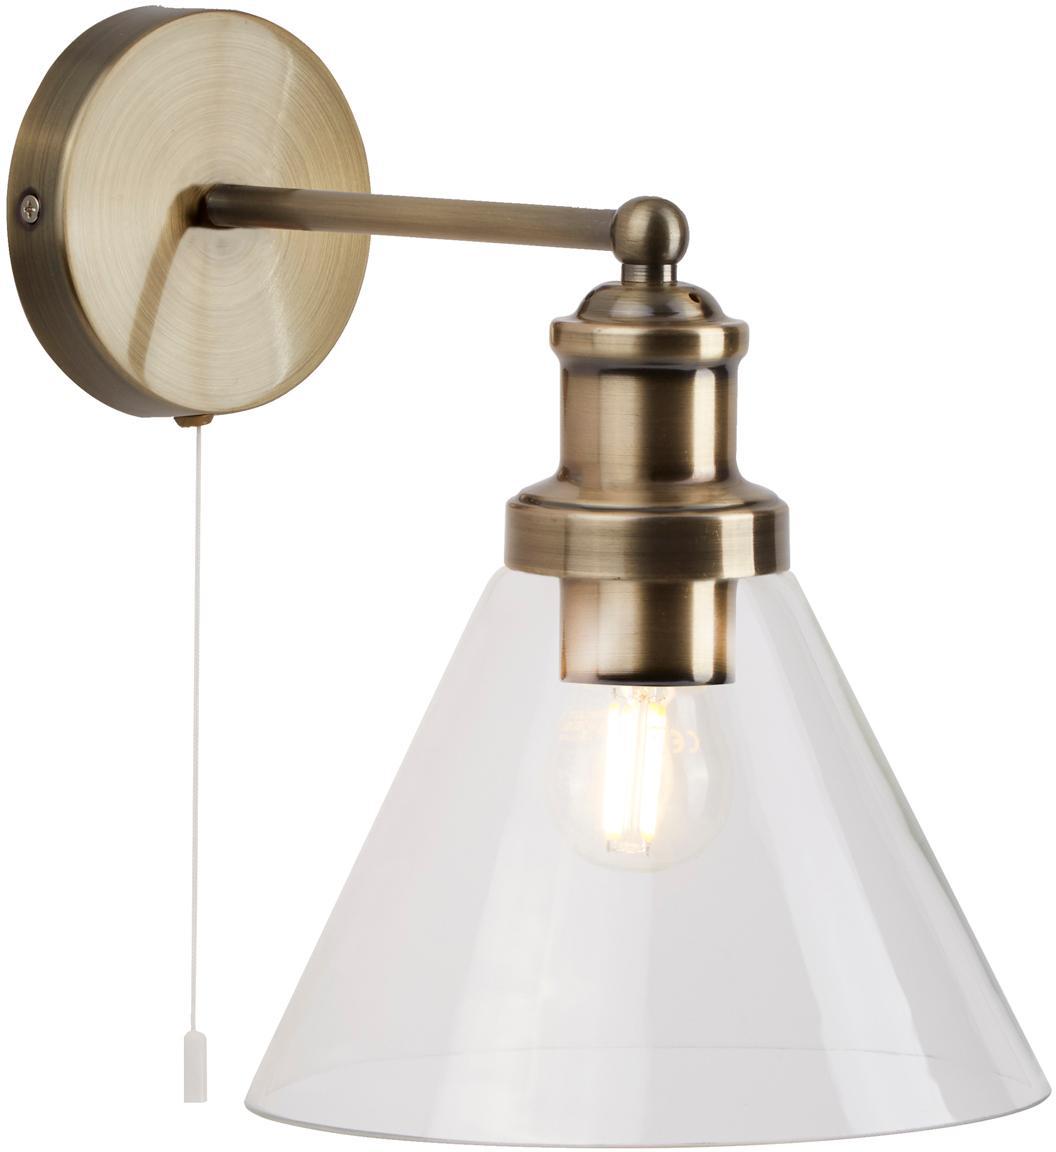 Wandleuchte Pyramid, Lampenschirm: Glas, Messing, Transparent, 19 x 25 cm